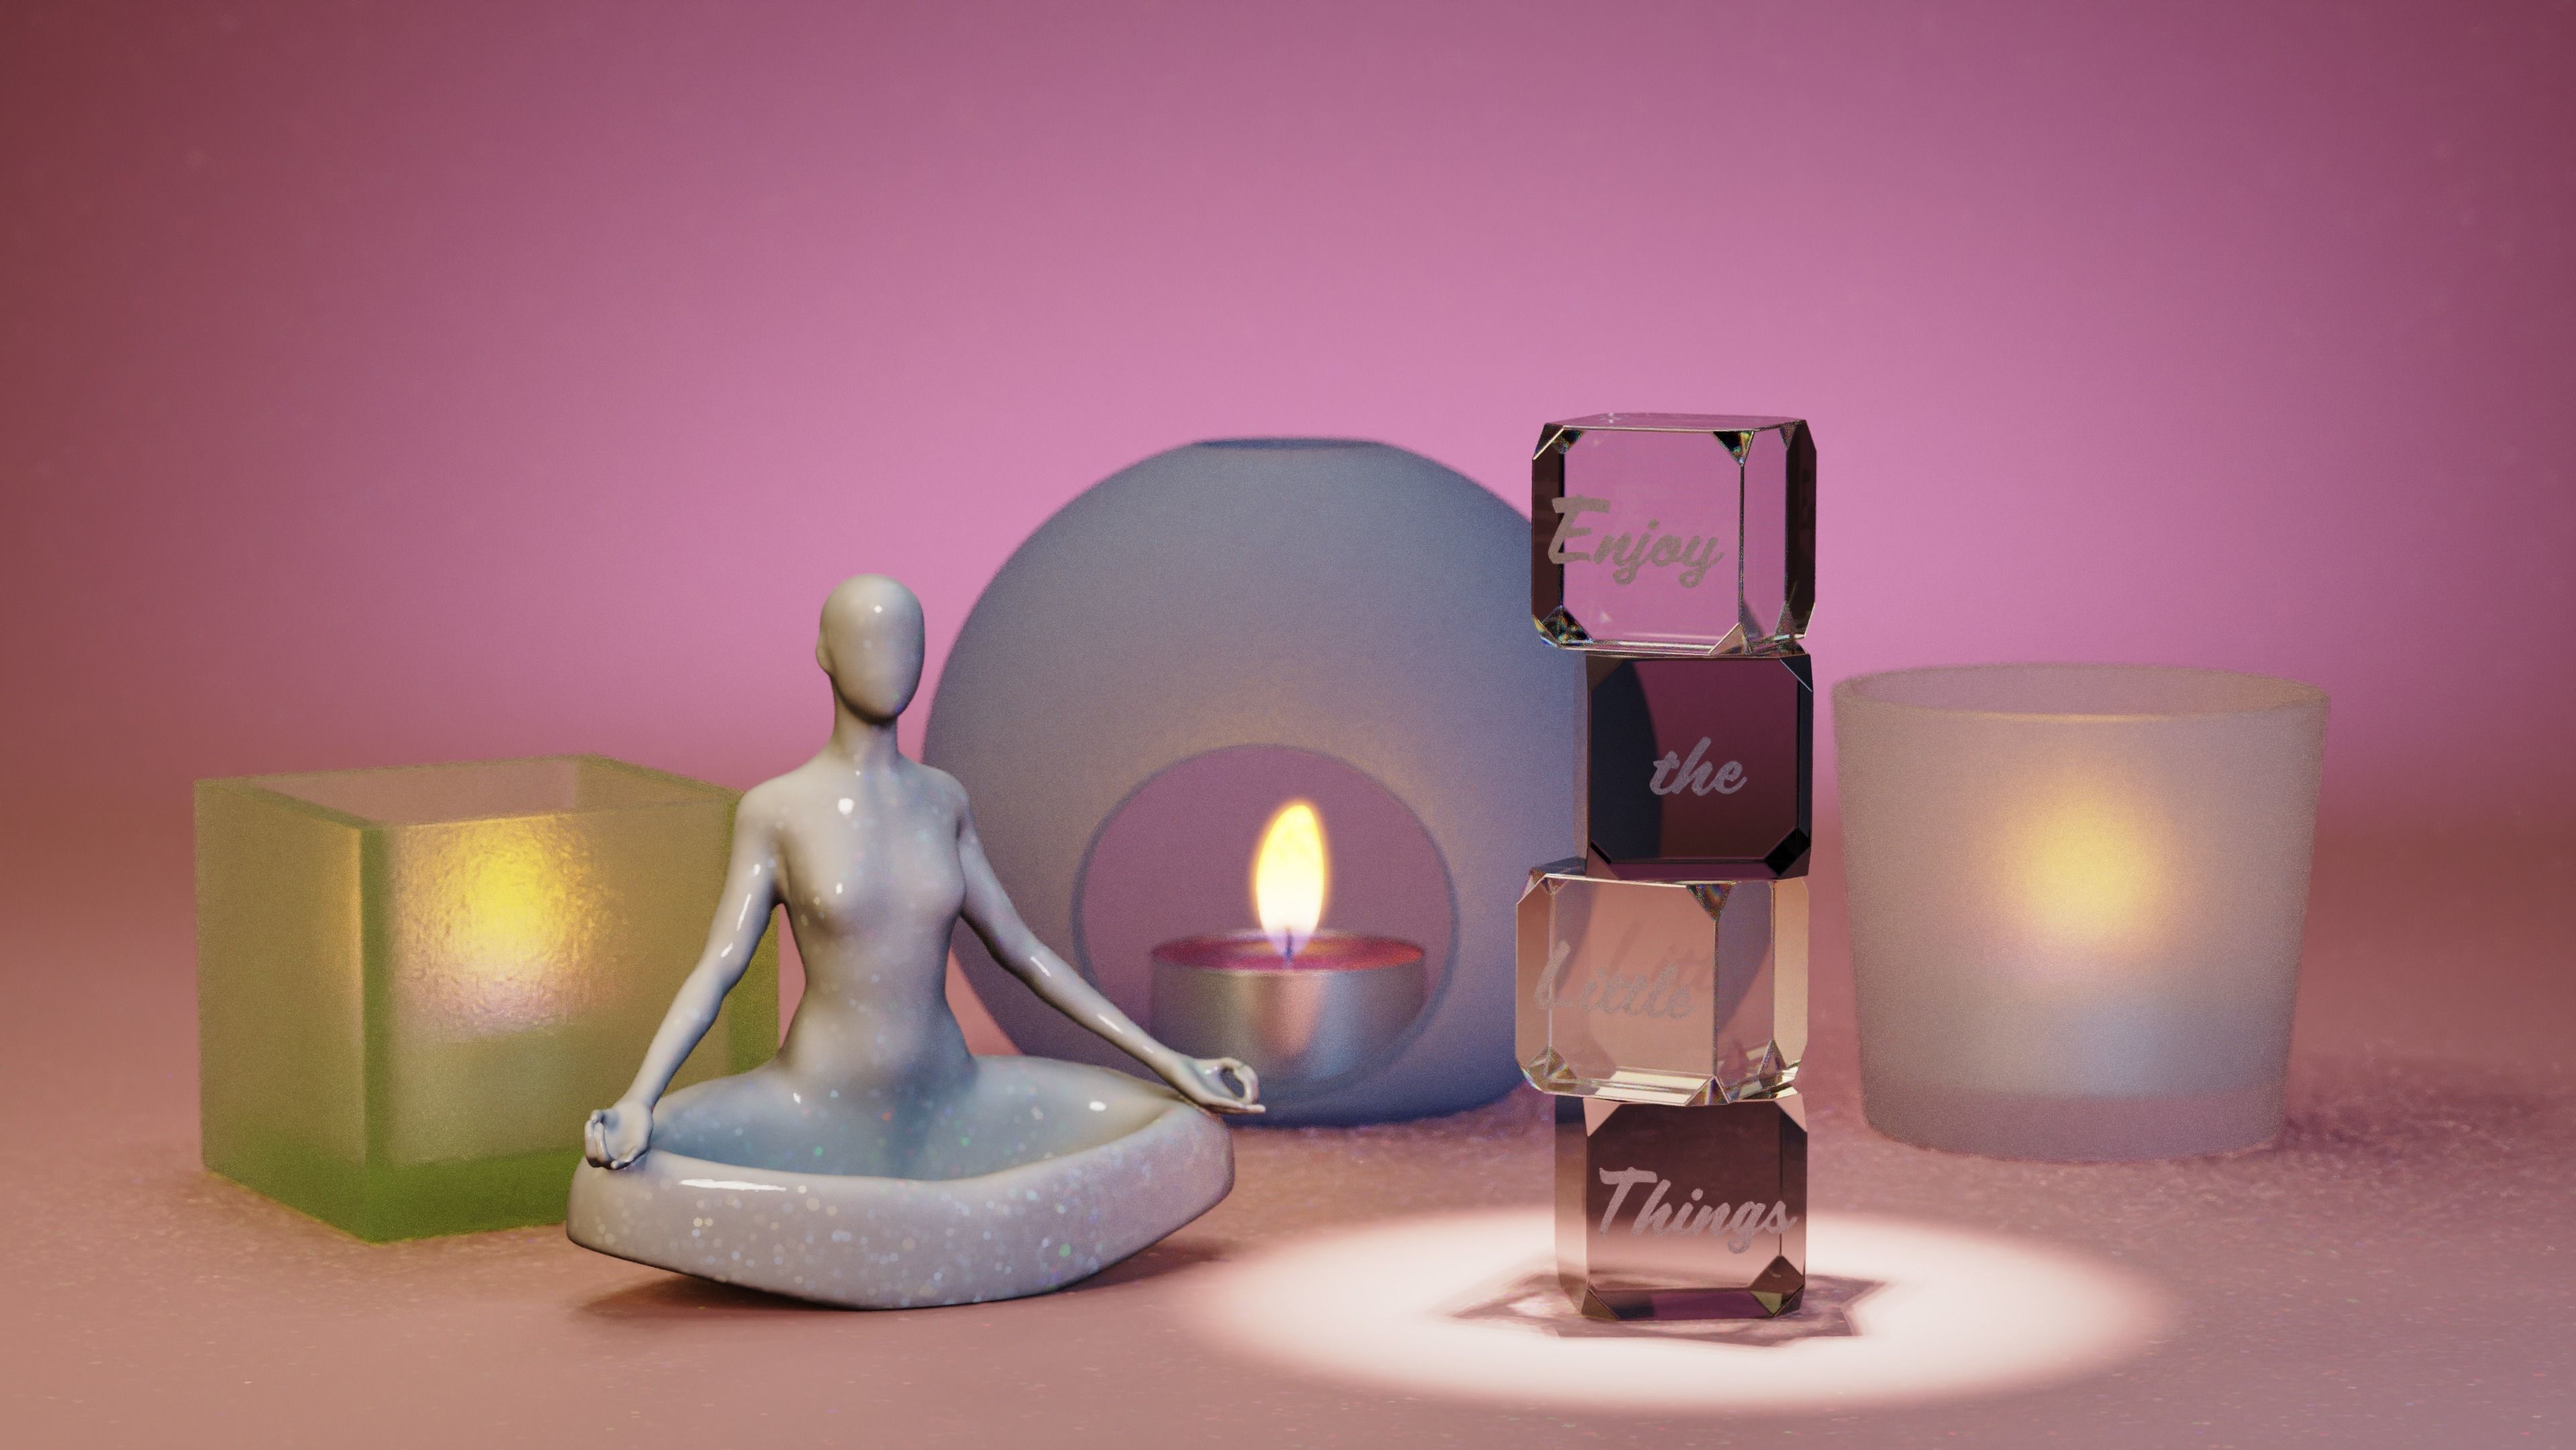 YOGA WOMAN POT - STL FOR 3D PRINTING